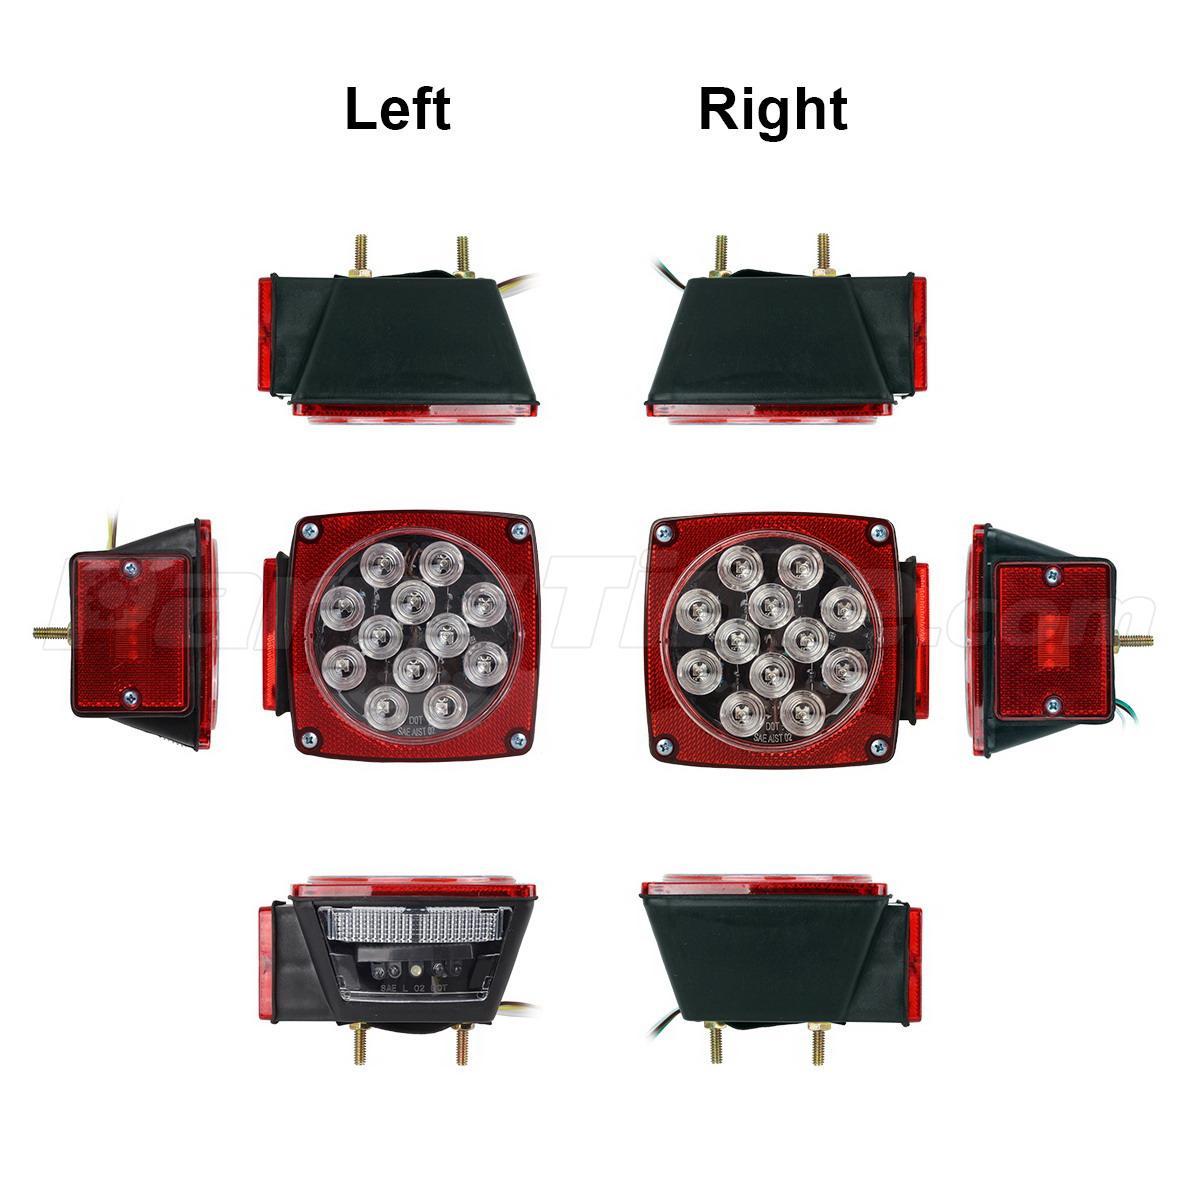 Snowmobile trailer running lights not working / Bivash academy of ...